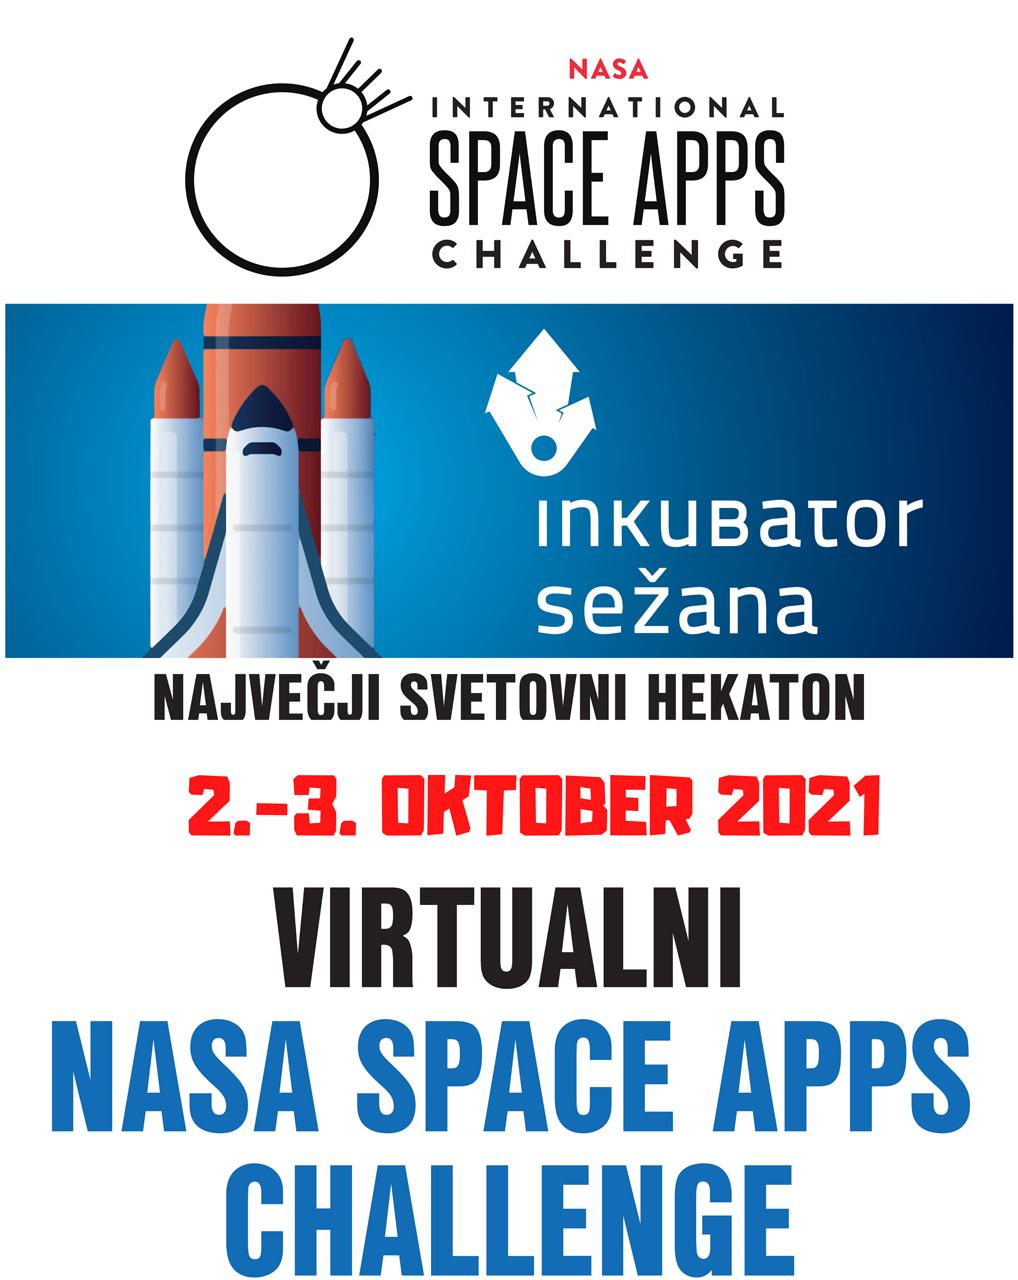 NASA International Space Apps Challenge Sežana 2021